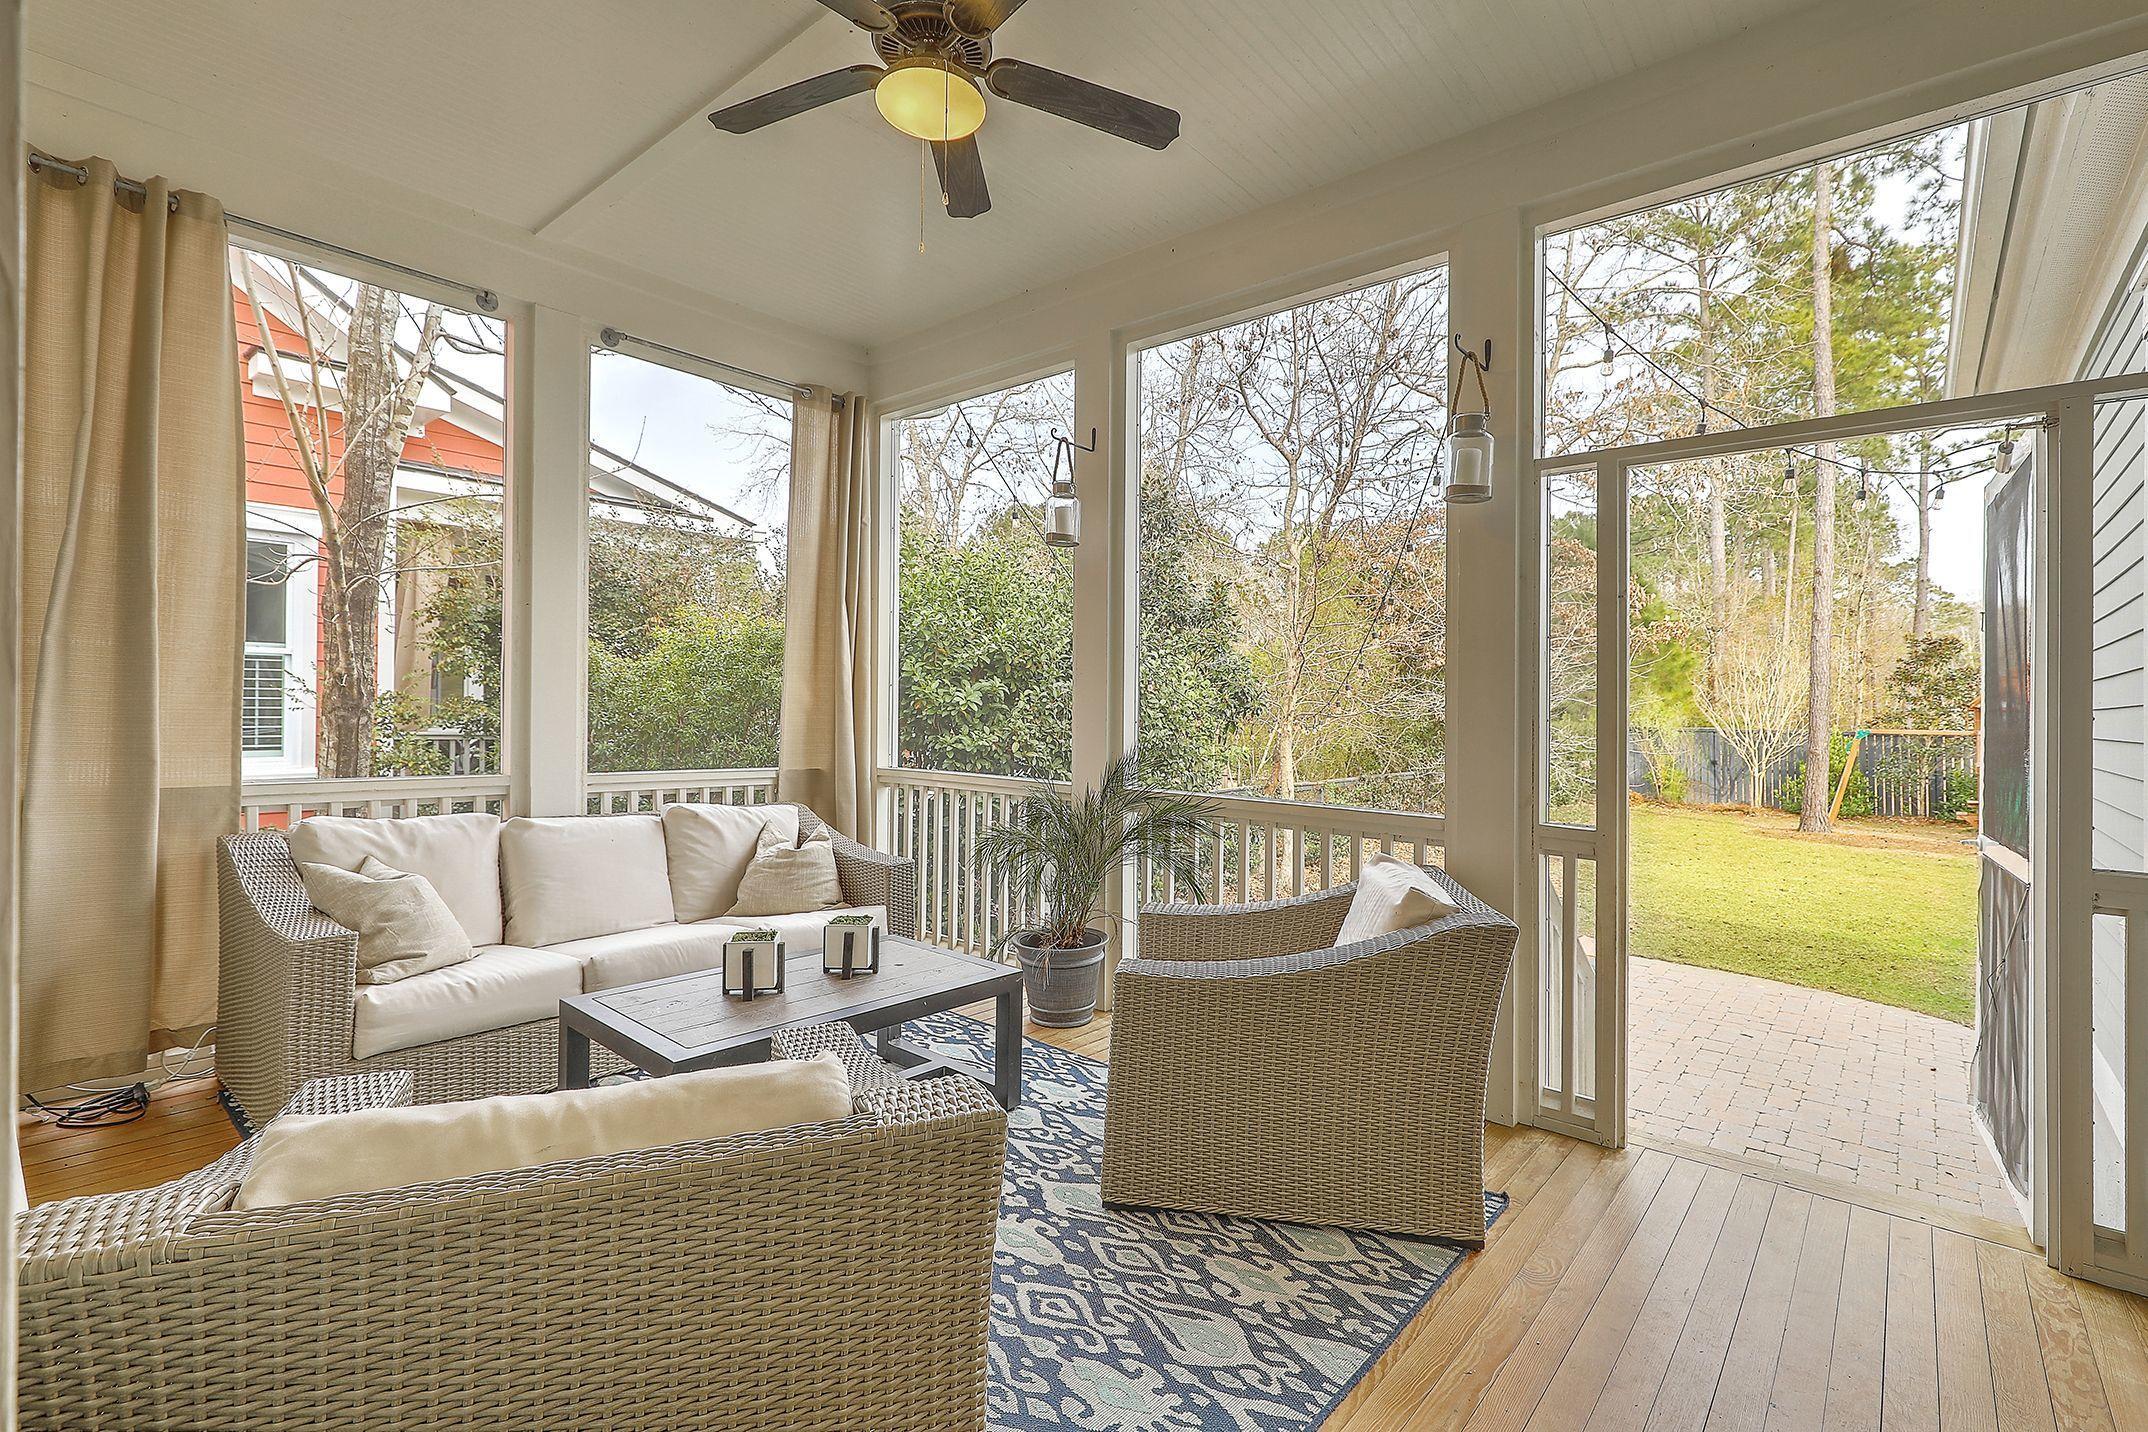 Carolina Park Homes For Sale - 1466 Gunnison, Mount Pleasant, SC - 30